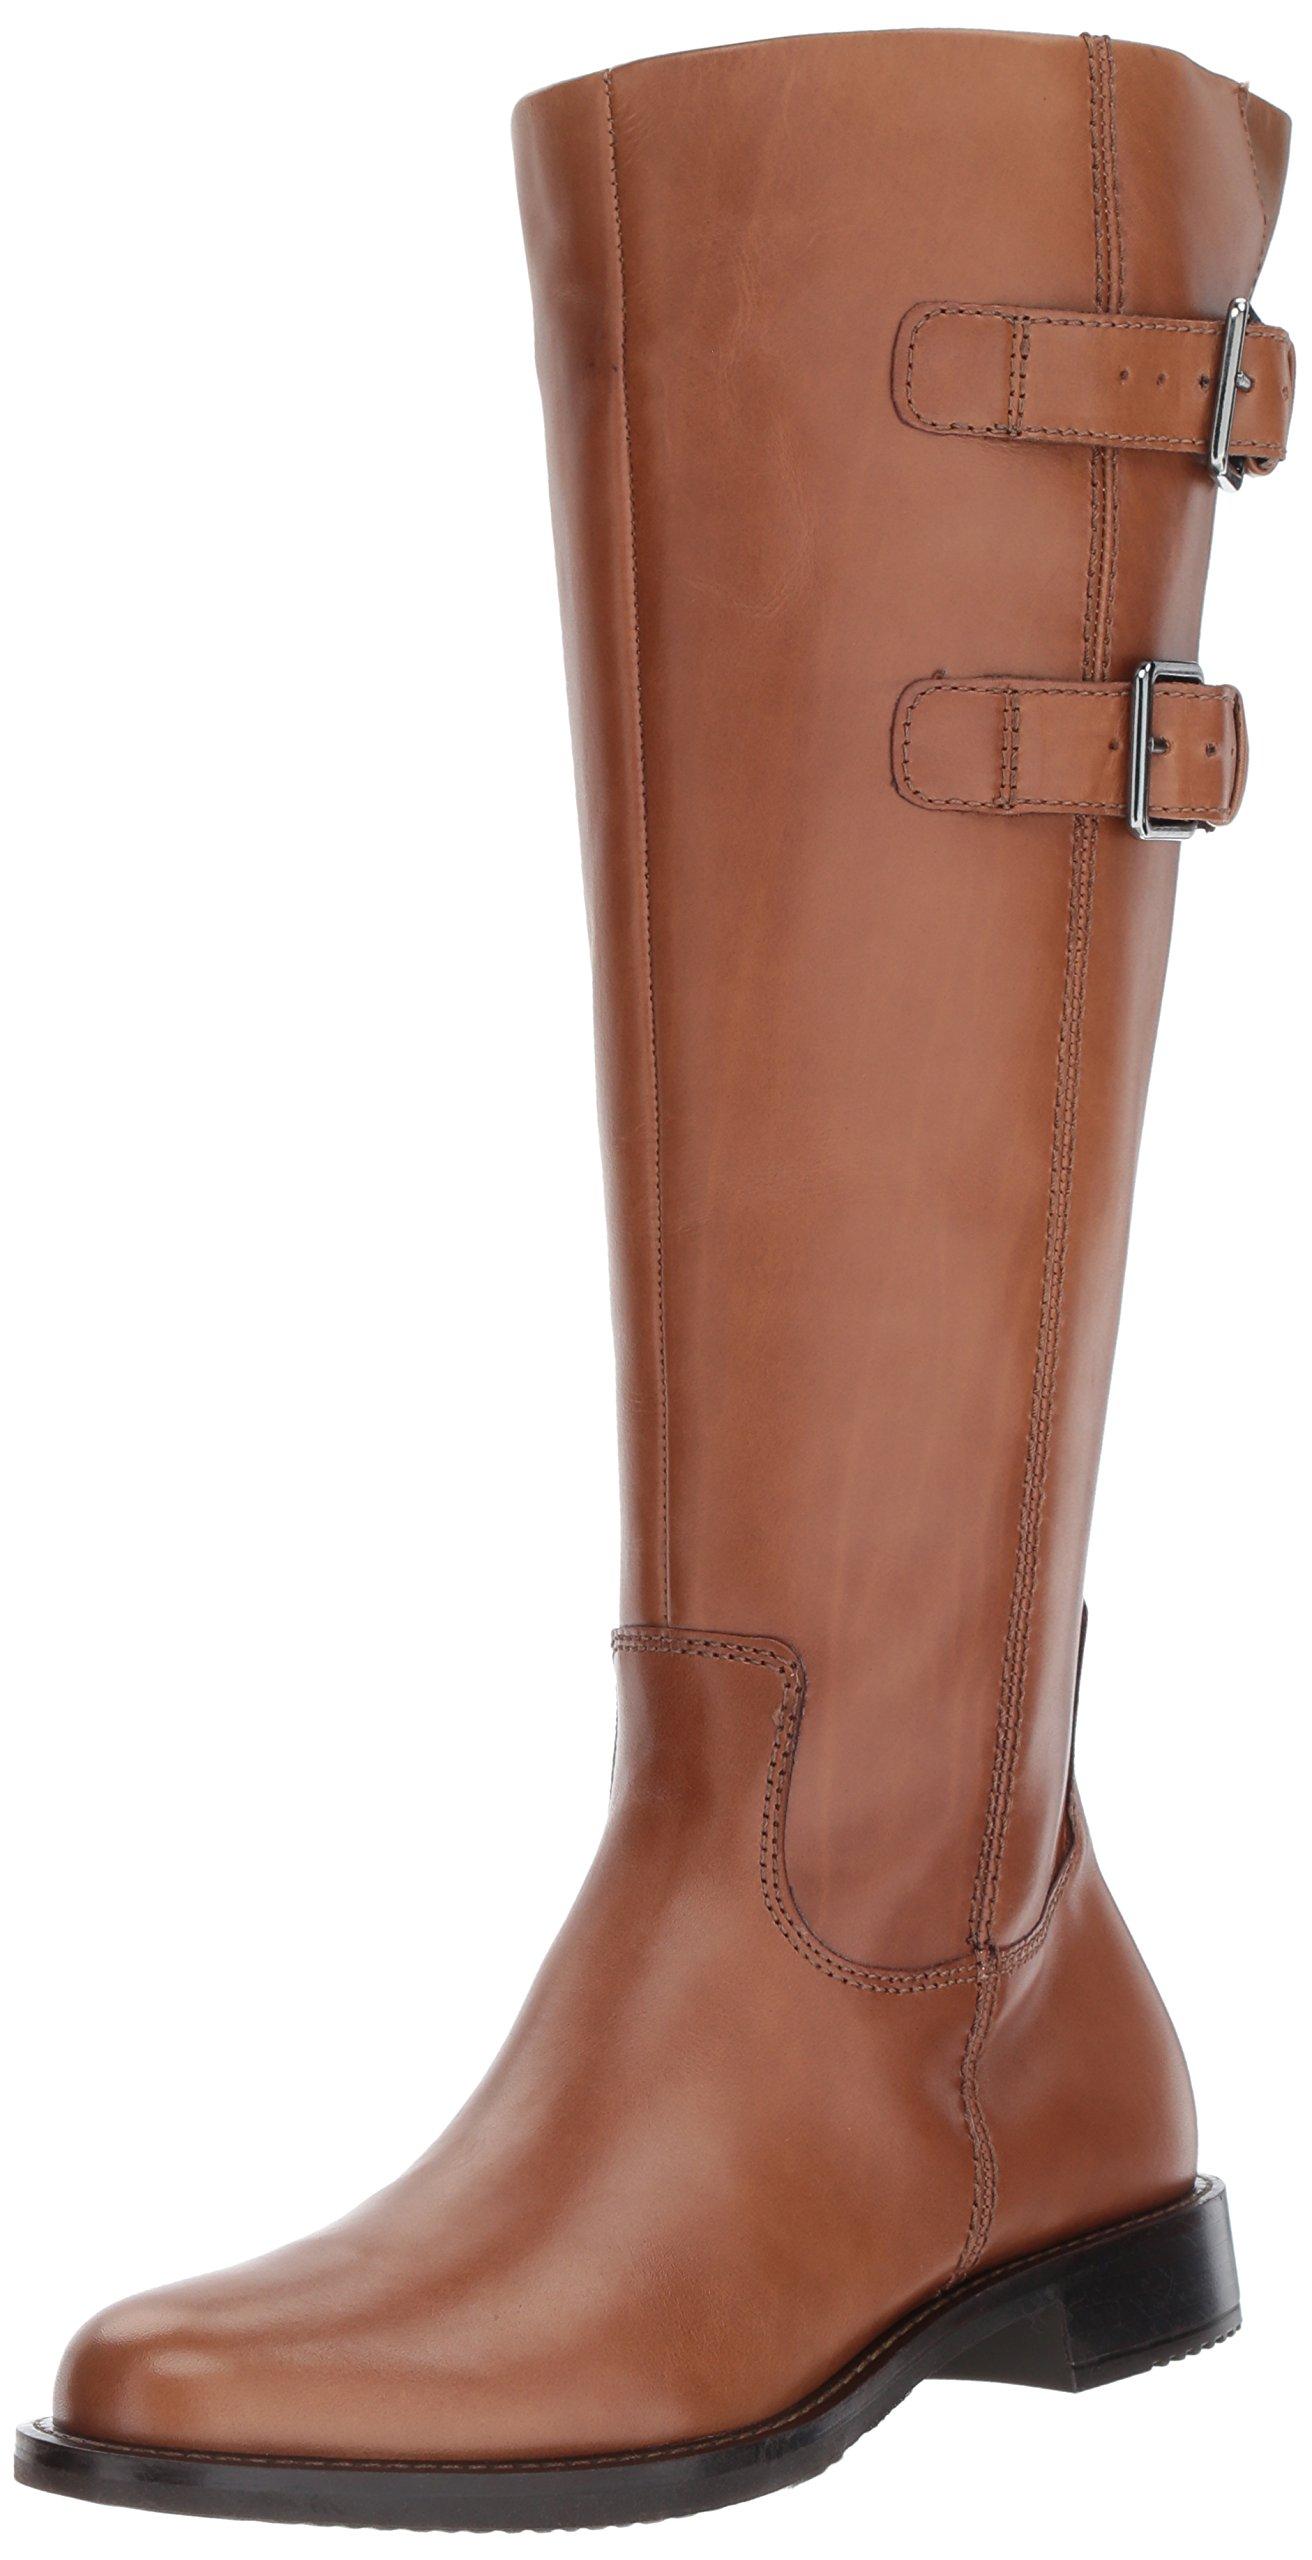 ECCO Women's Shape 25 Tall Buckle Riding Boot,Camel,39 EU/8-8.5 M US